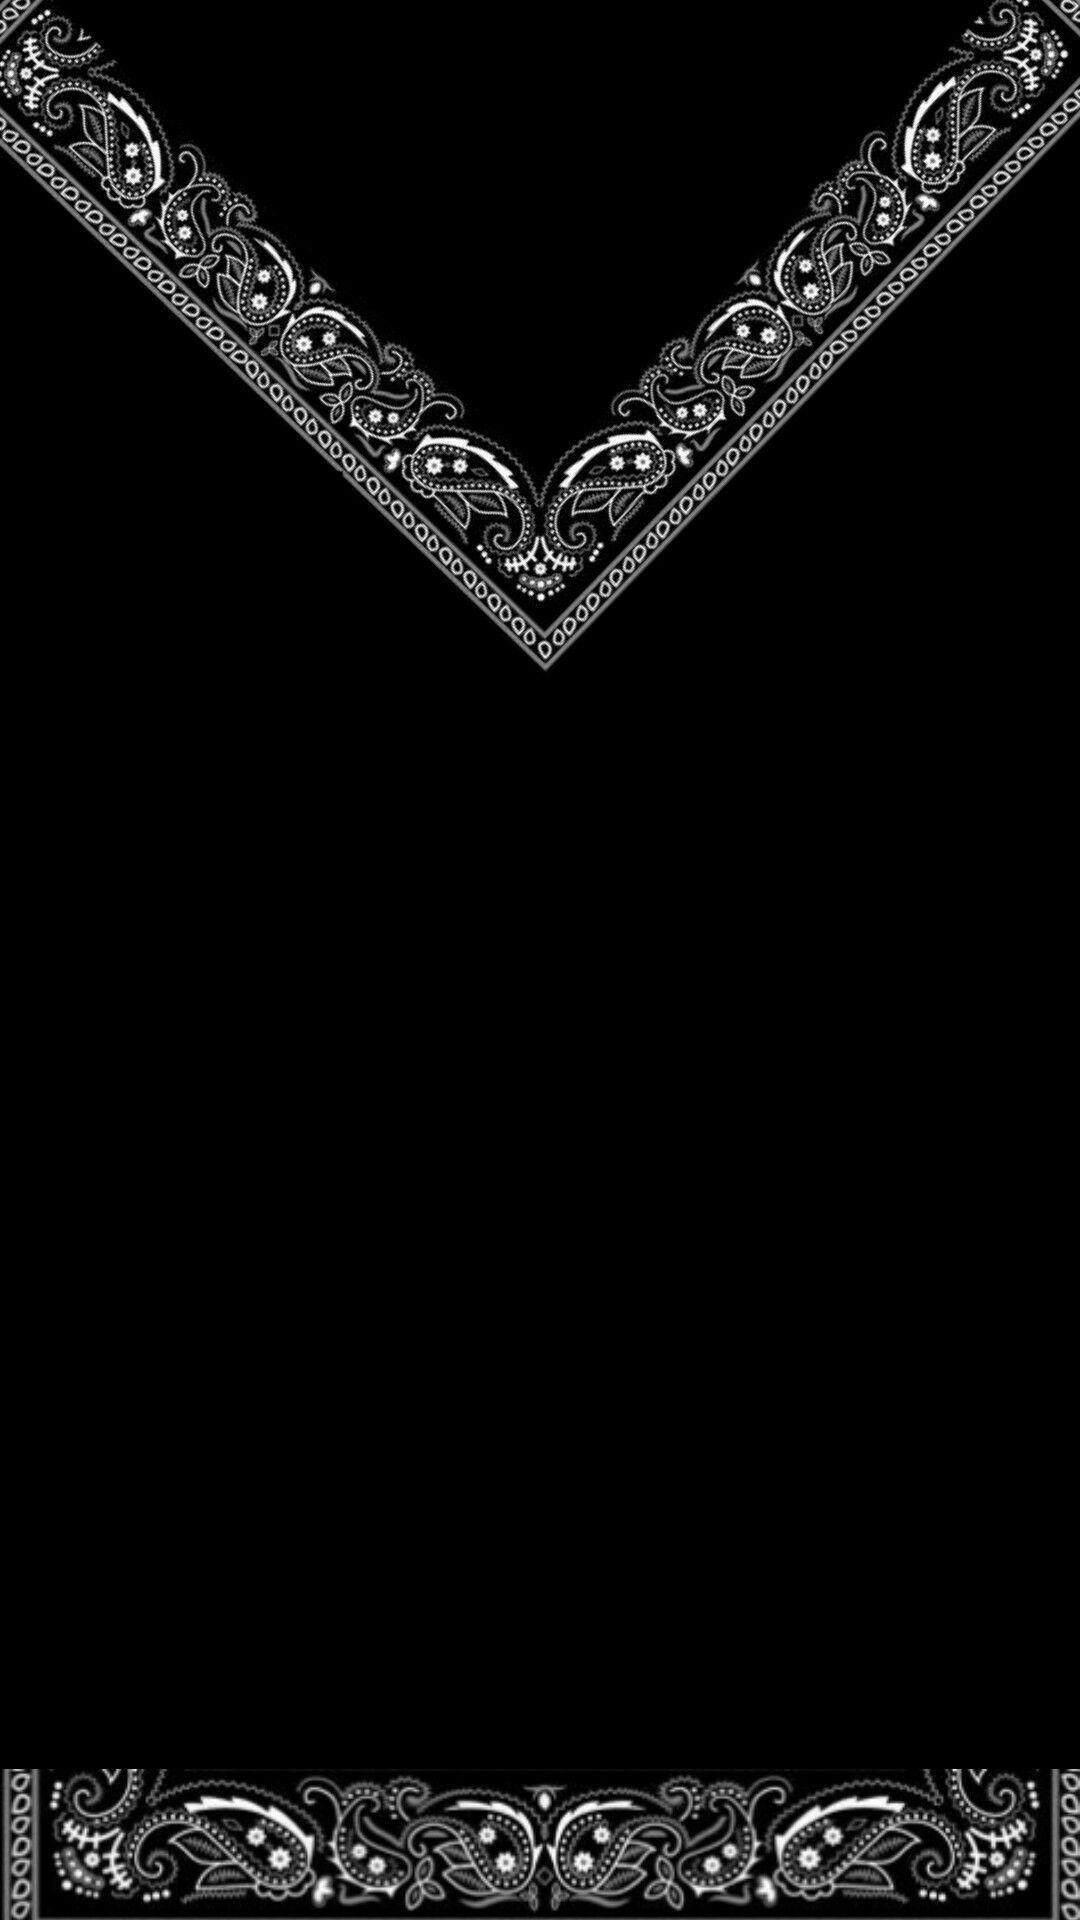 Black Bandana Wallpapers - Top Free